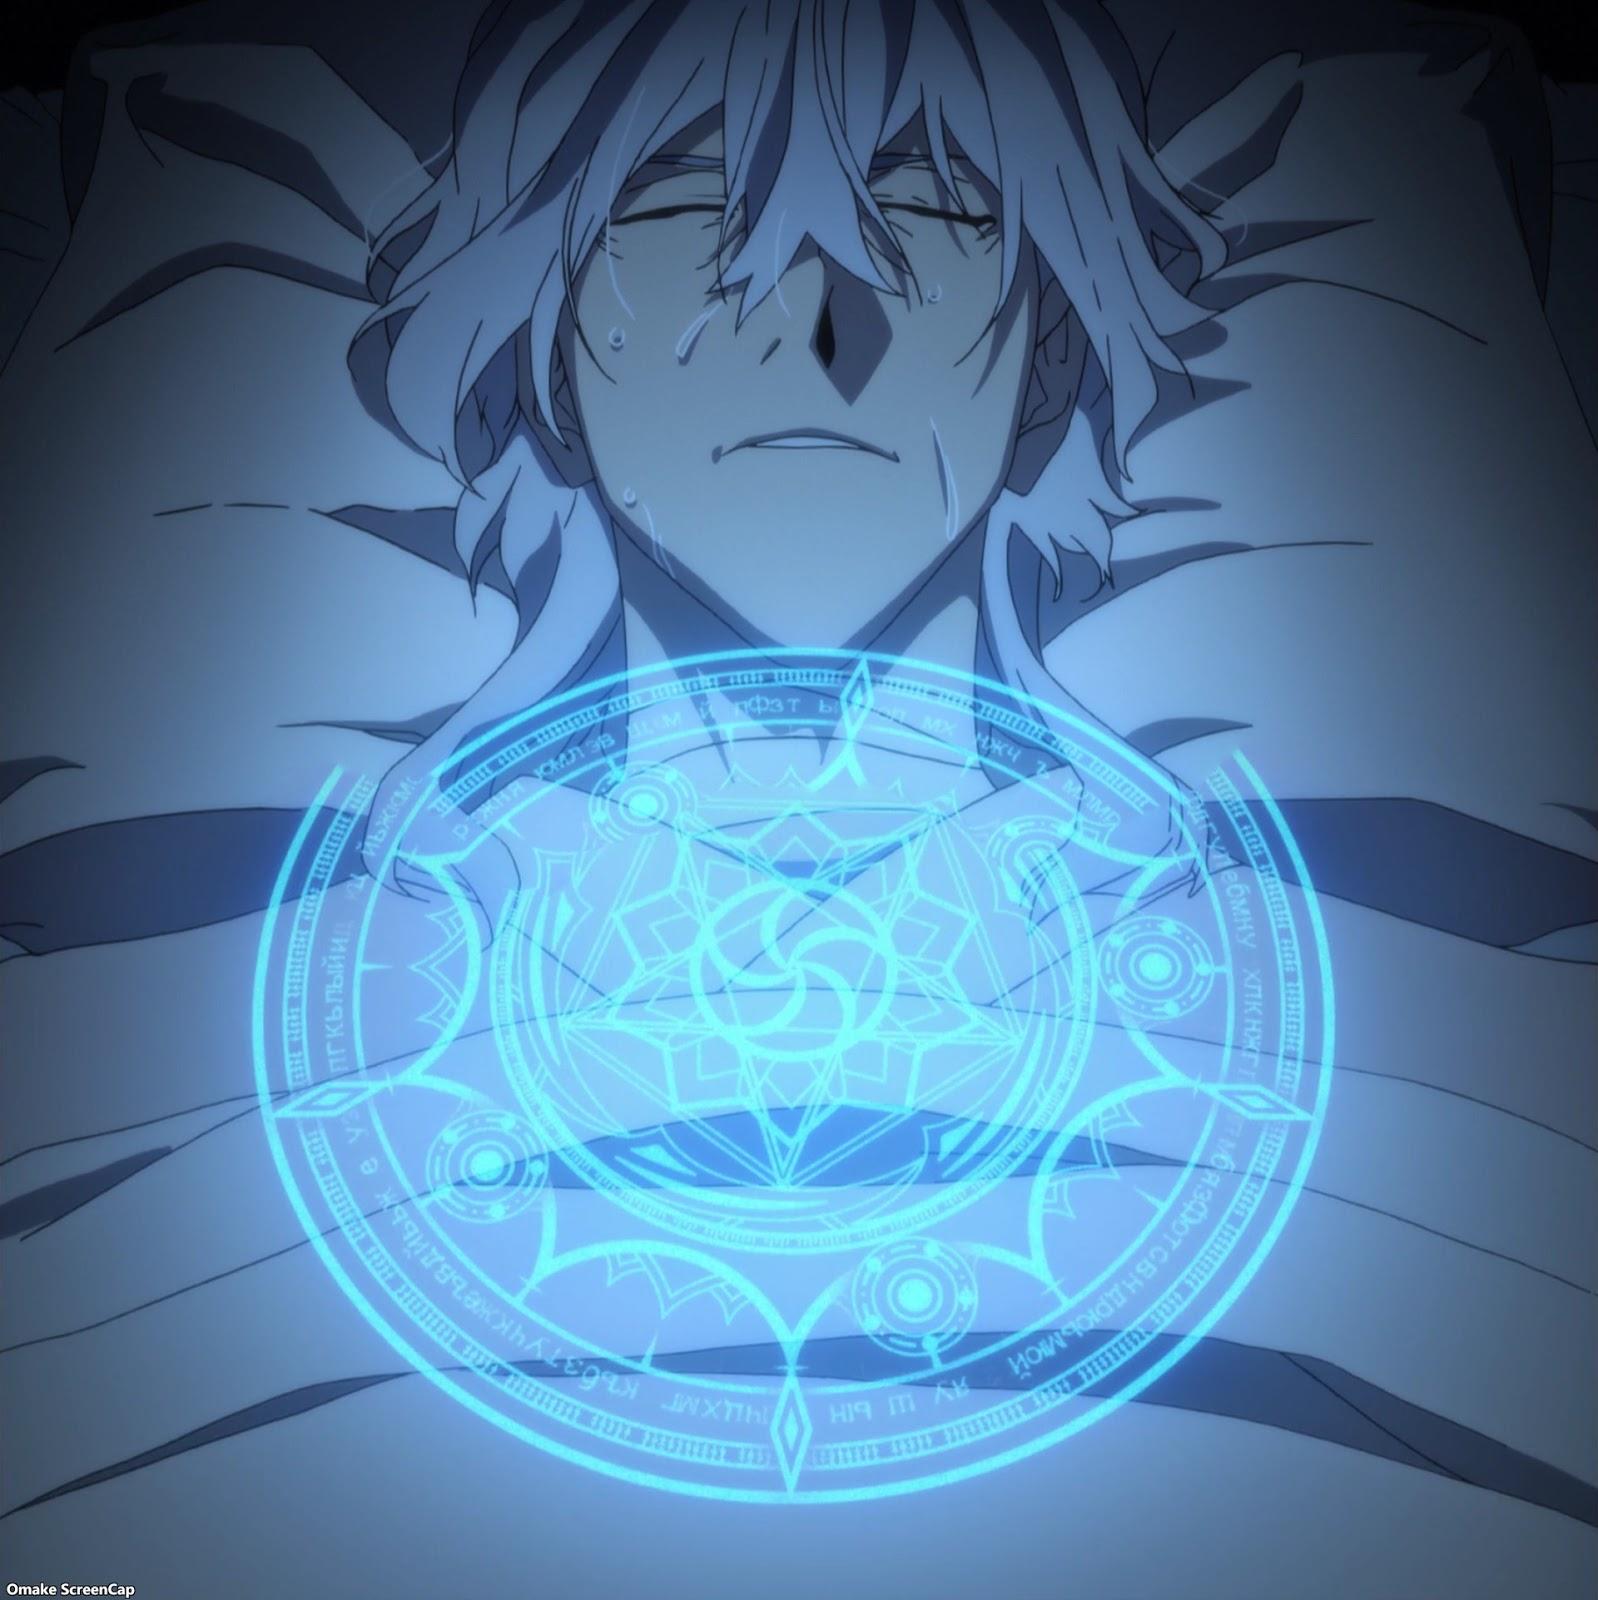 Joeschmo's Gears and Grounds: 10 Second Anime - Bungou Stray